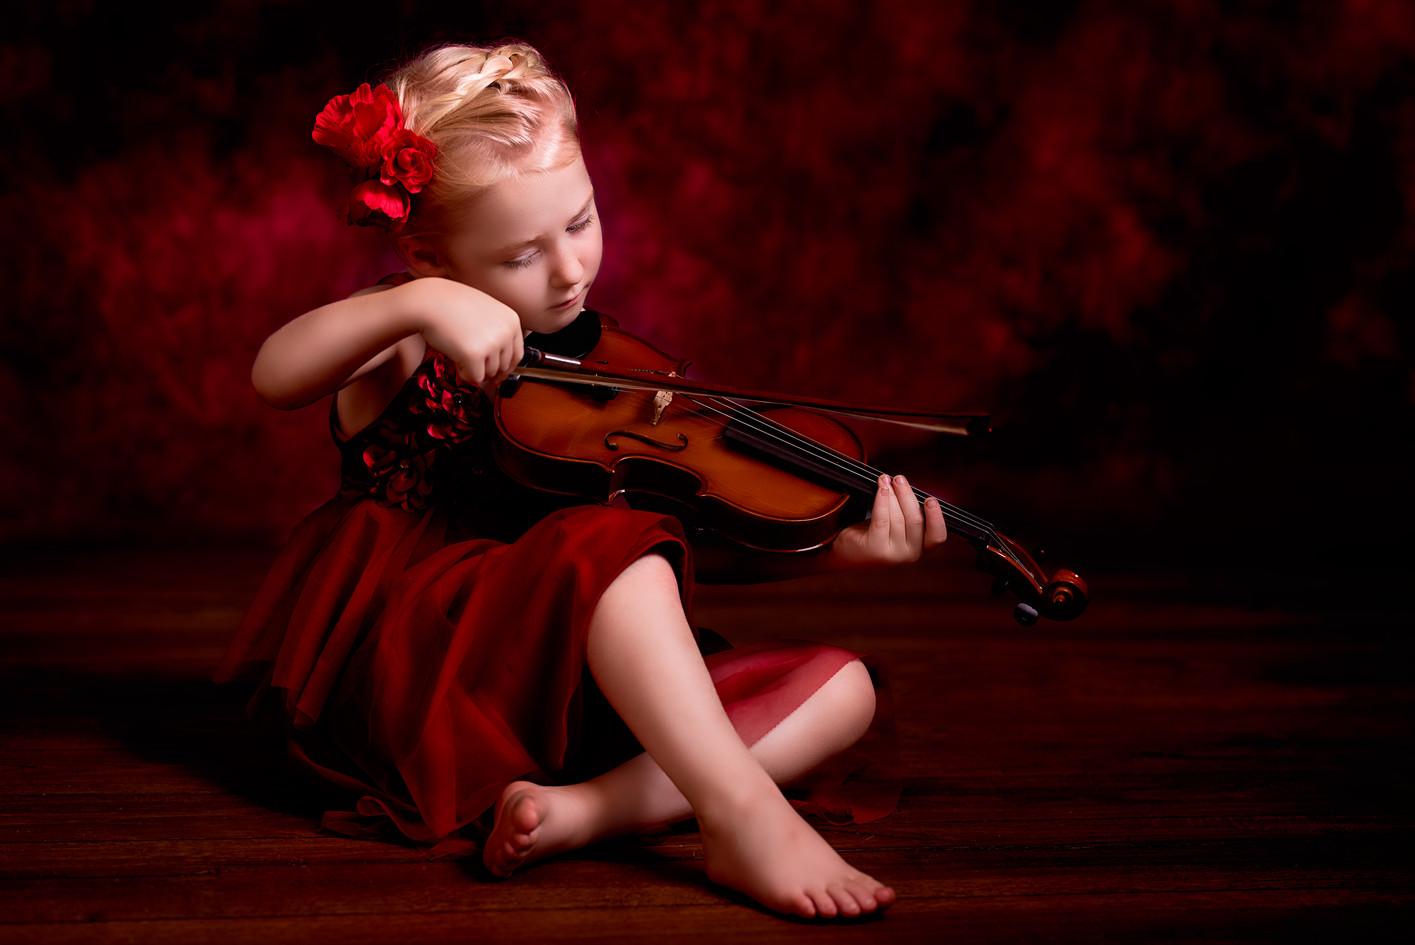 Fine art musical photo